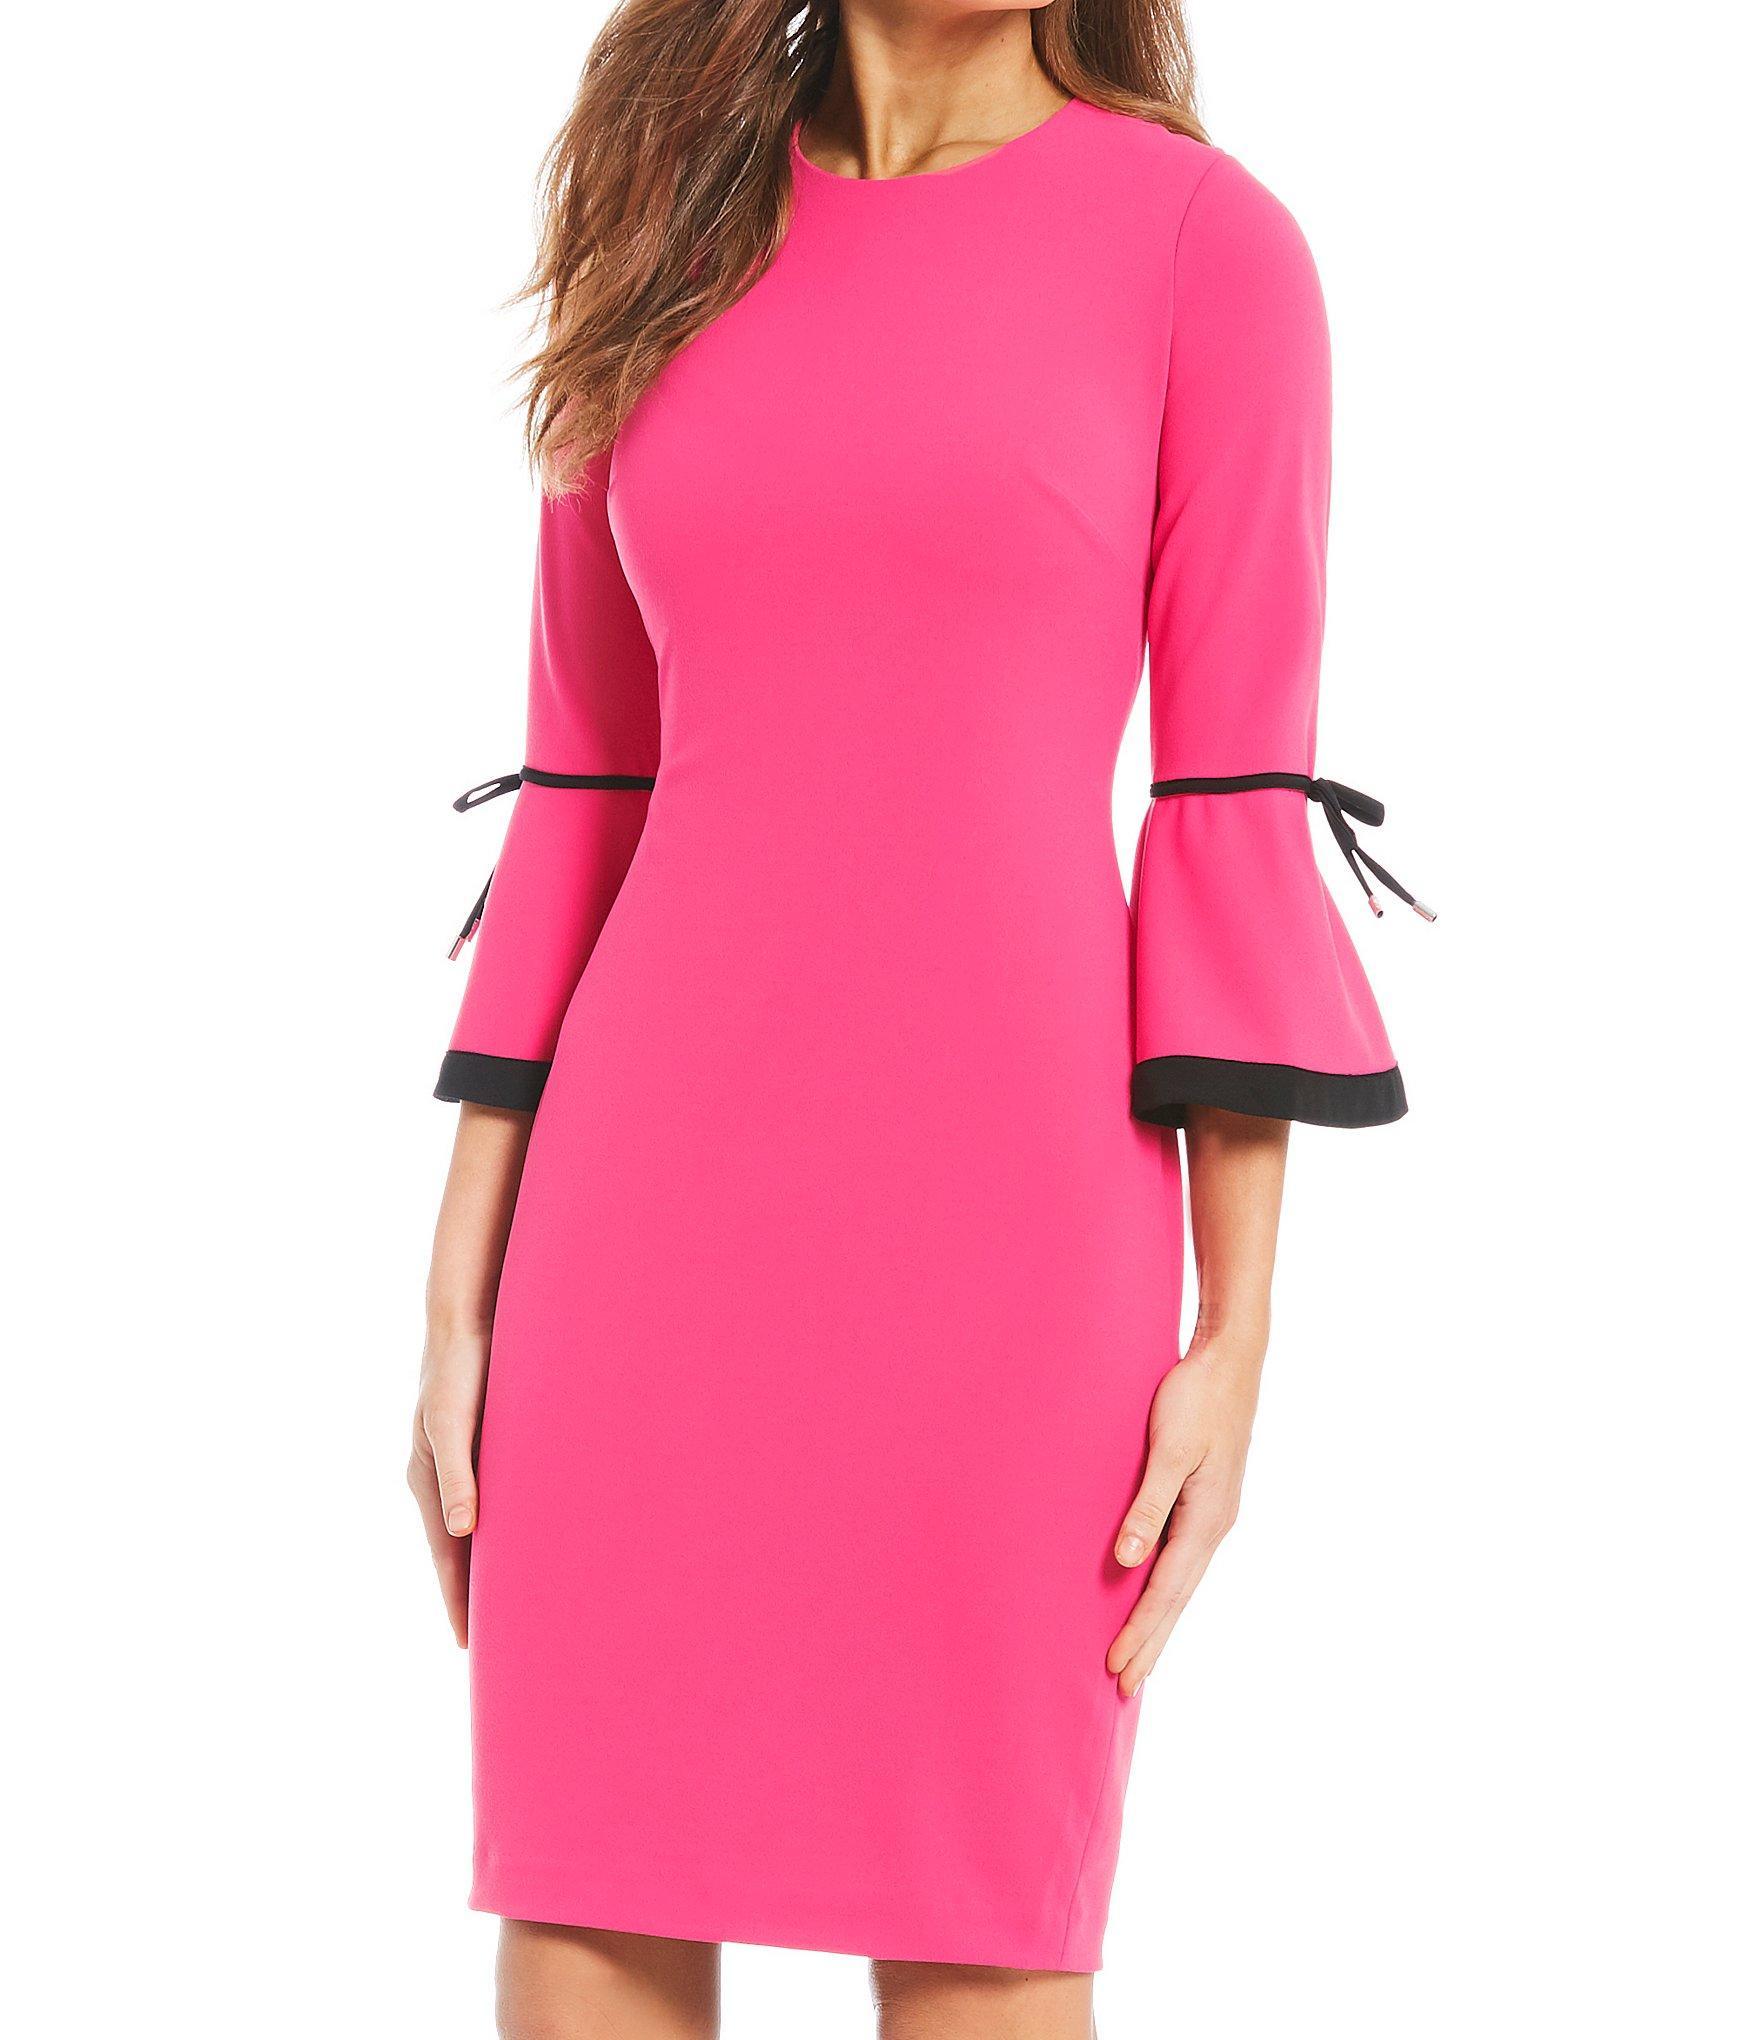 c0c2e101 Calvin Klein - Pink Contrast Trim Bell Sleeve Sheath Dress - Lyst. View  fullscreen